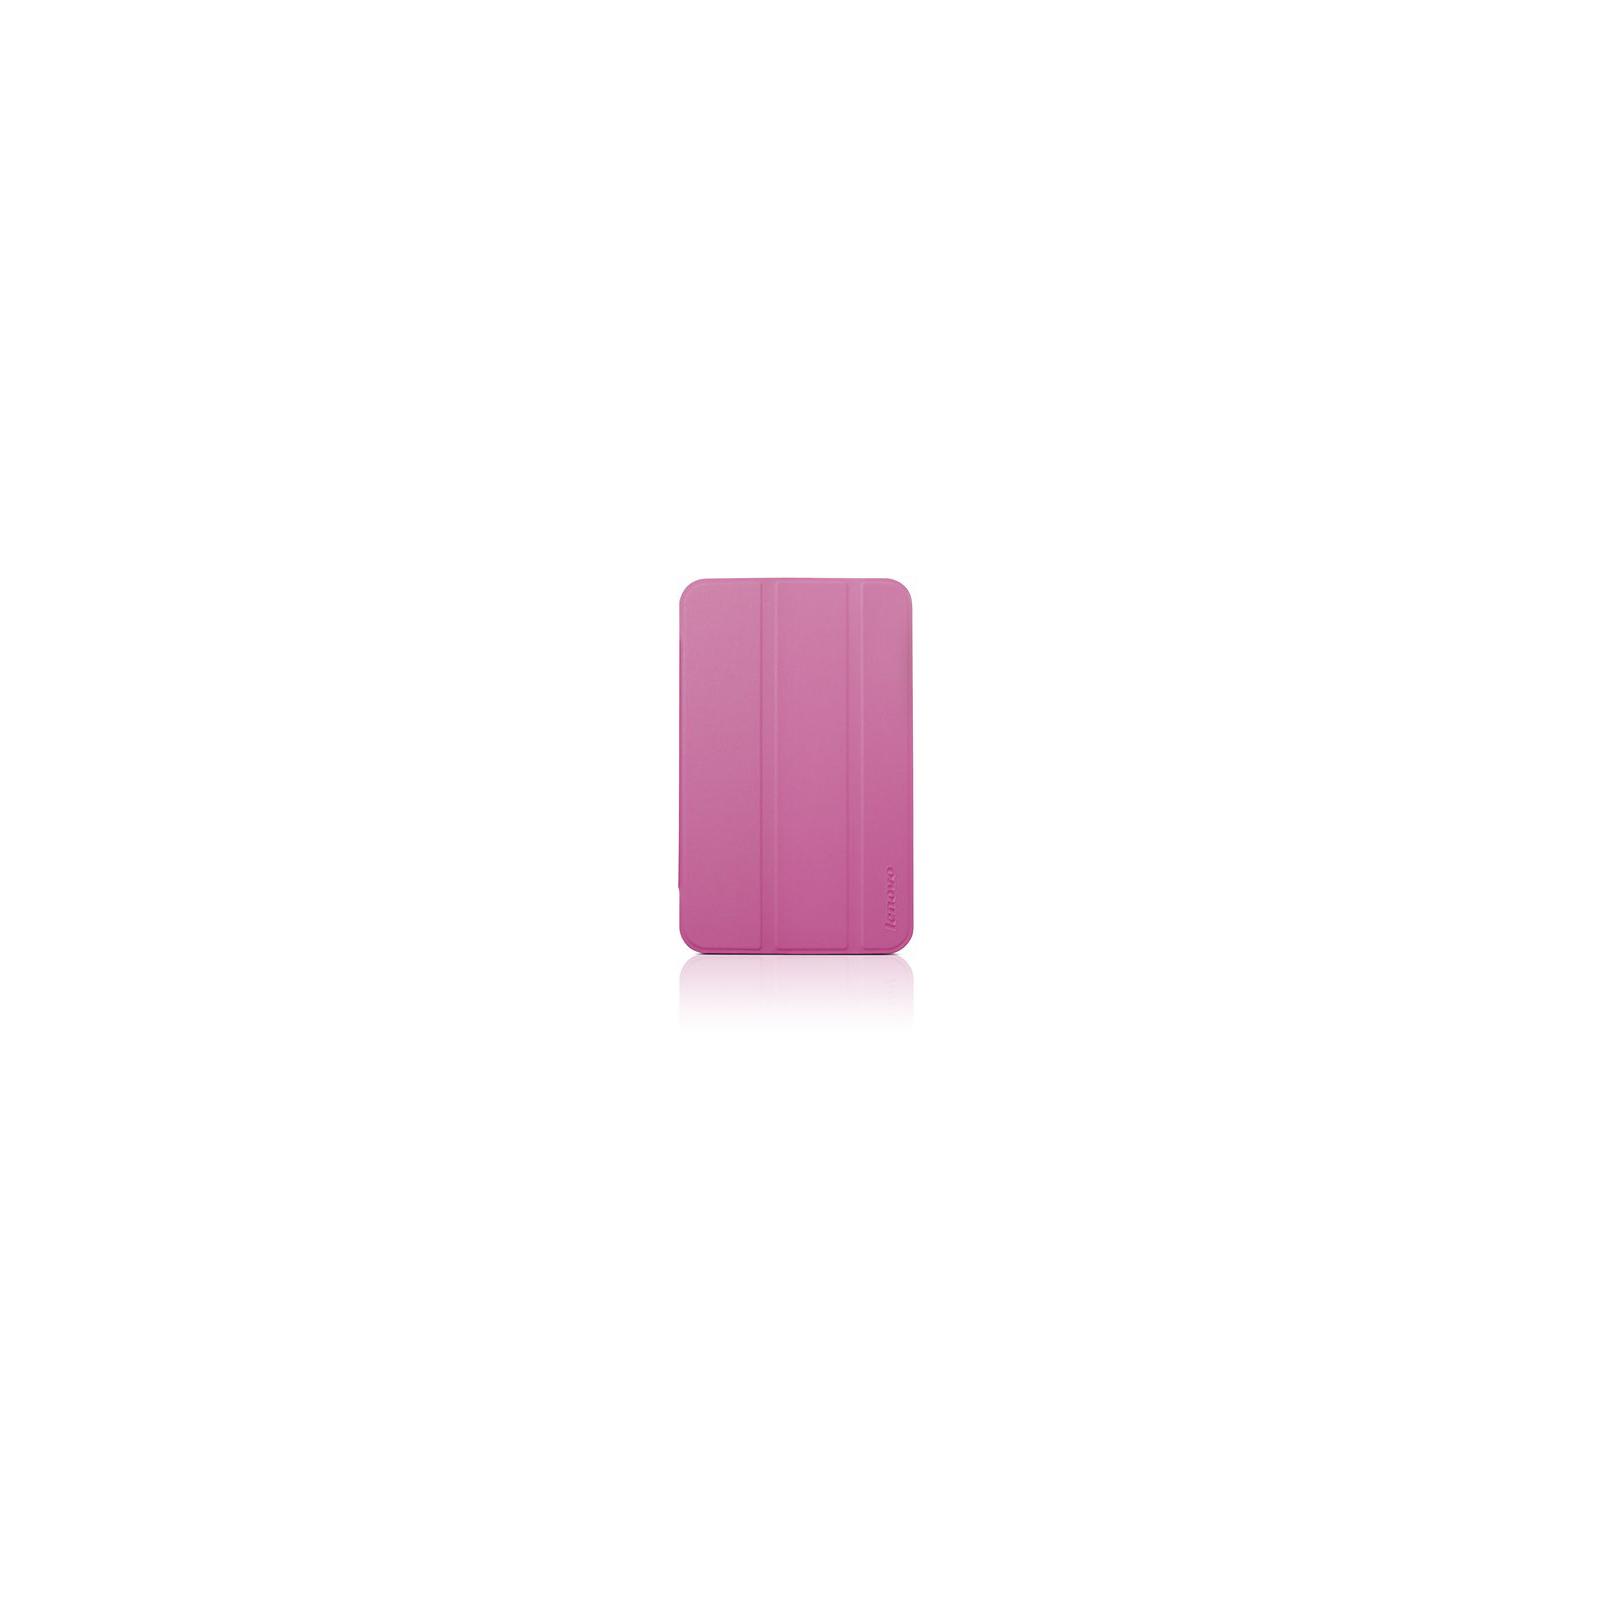 Чехол для планшета Lenovo 7 A1000 Case and film Pink (888015418)